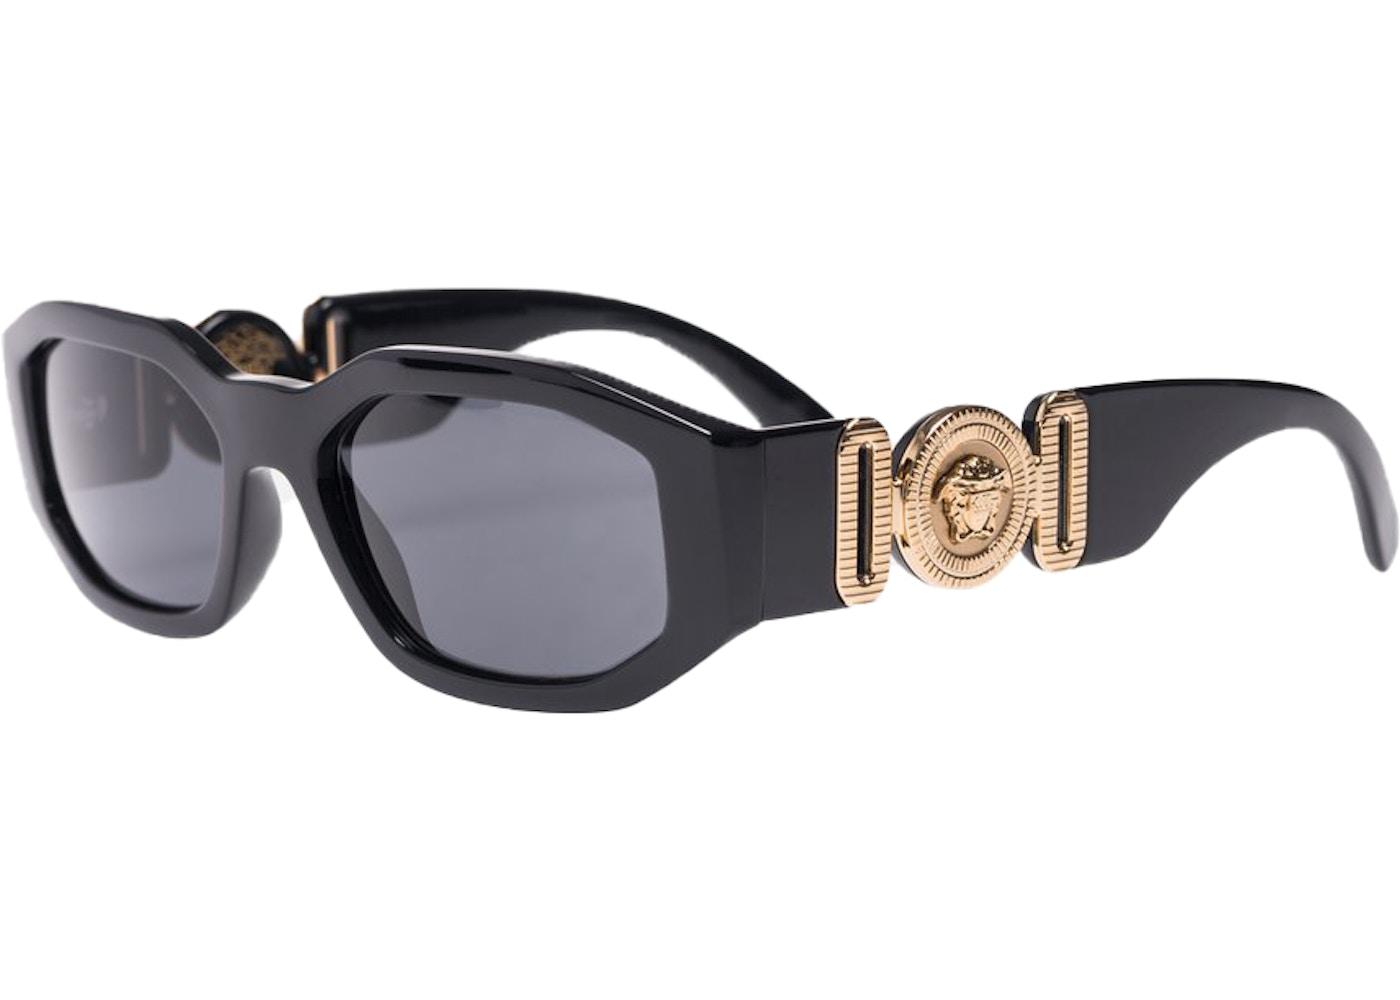 51f8e2081da3 Sell. or Ask. View All Bids. Kith x Versace Sunglasses Black Gold